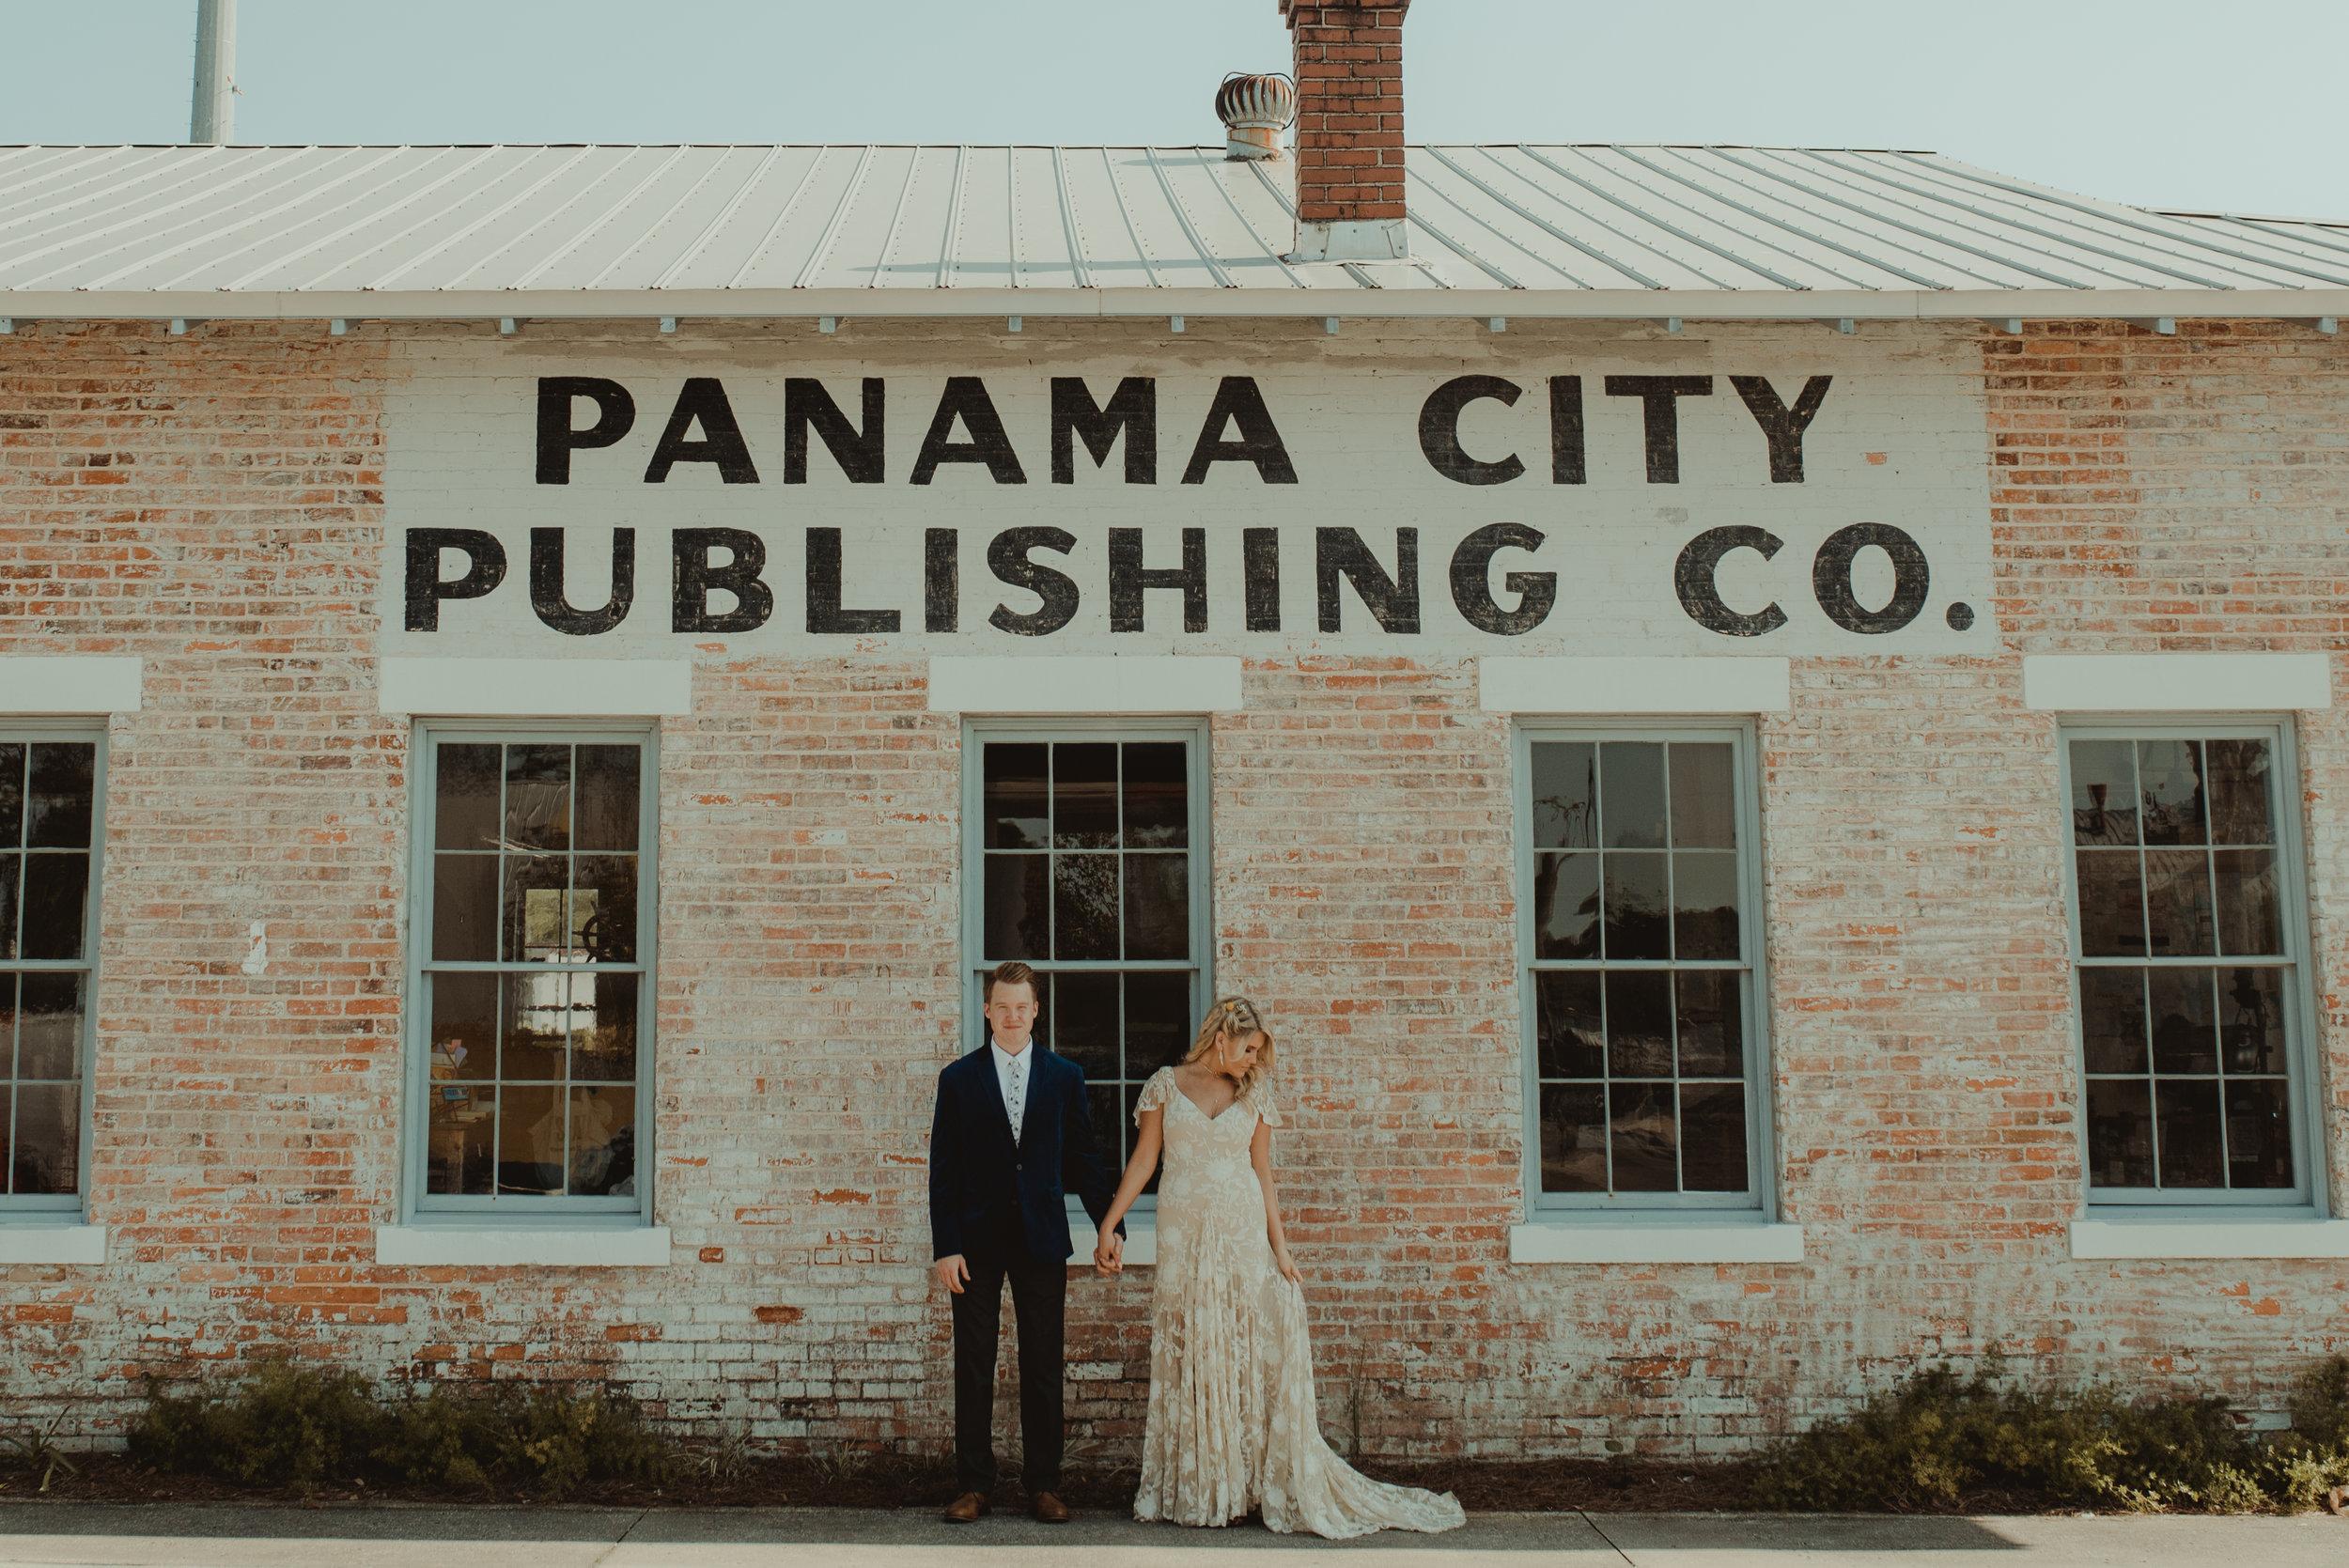 zayda-collin-panama-city-beach-bohemian-hippie-wedding-photography-lisa-frank-inspired-bride-groom-portraits-first-look-149.jpg